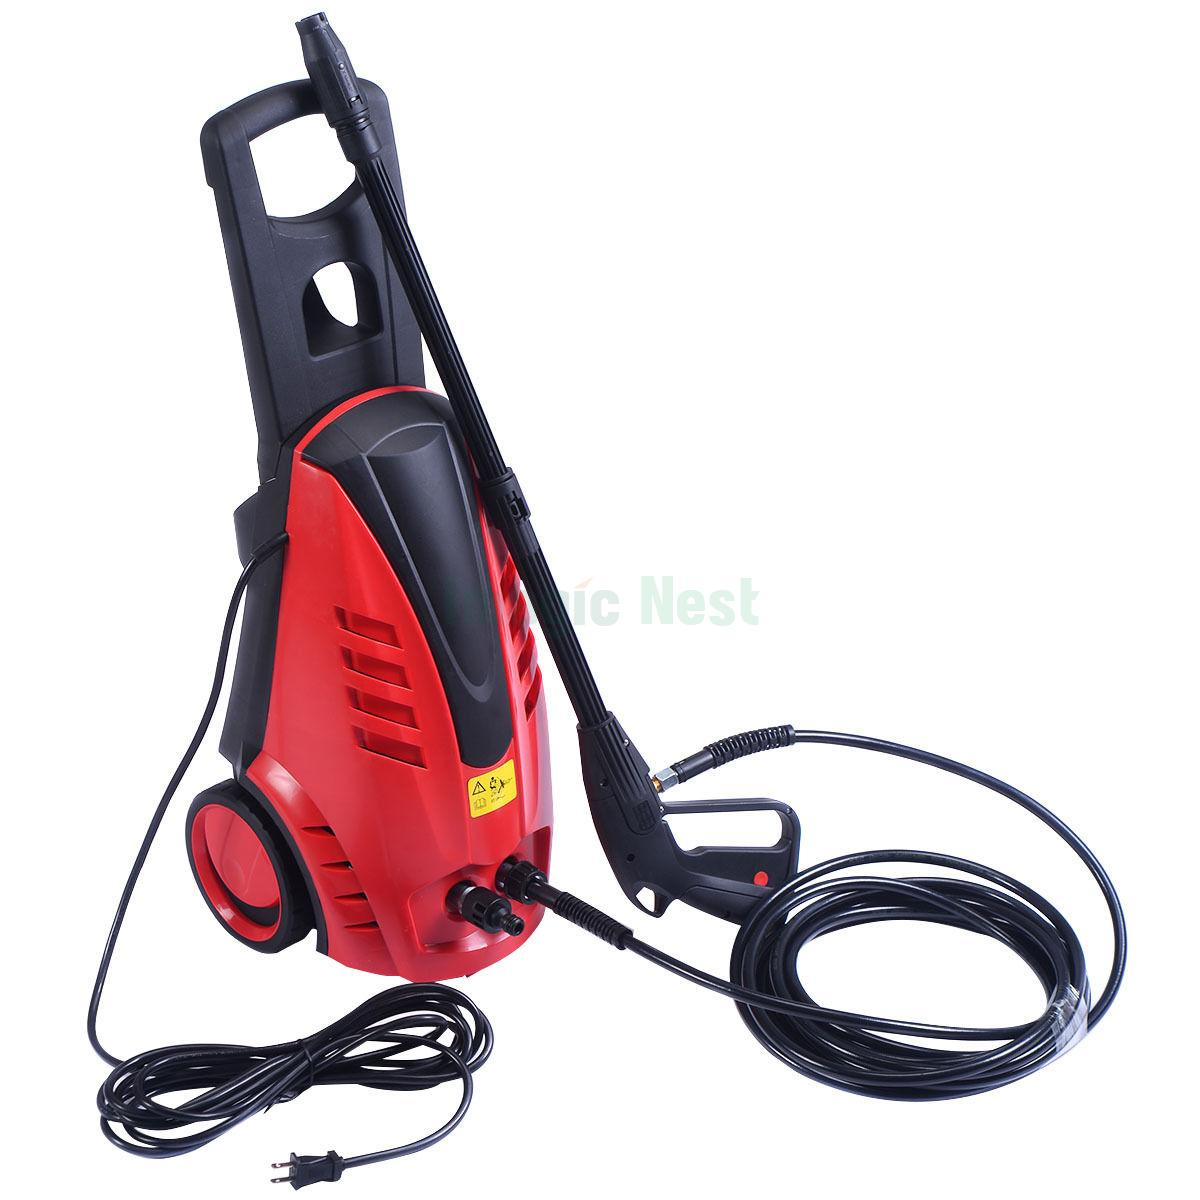 High Pressure Sprayer : W heavy duty burst electric high pressure washer